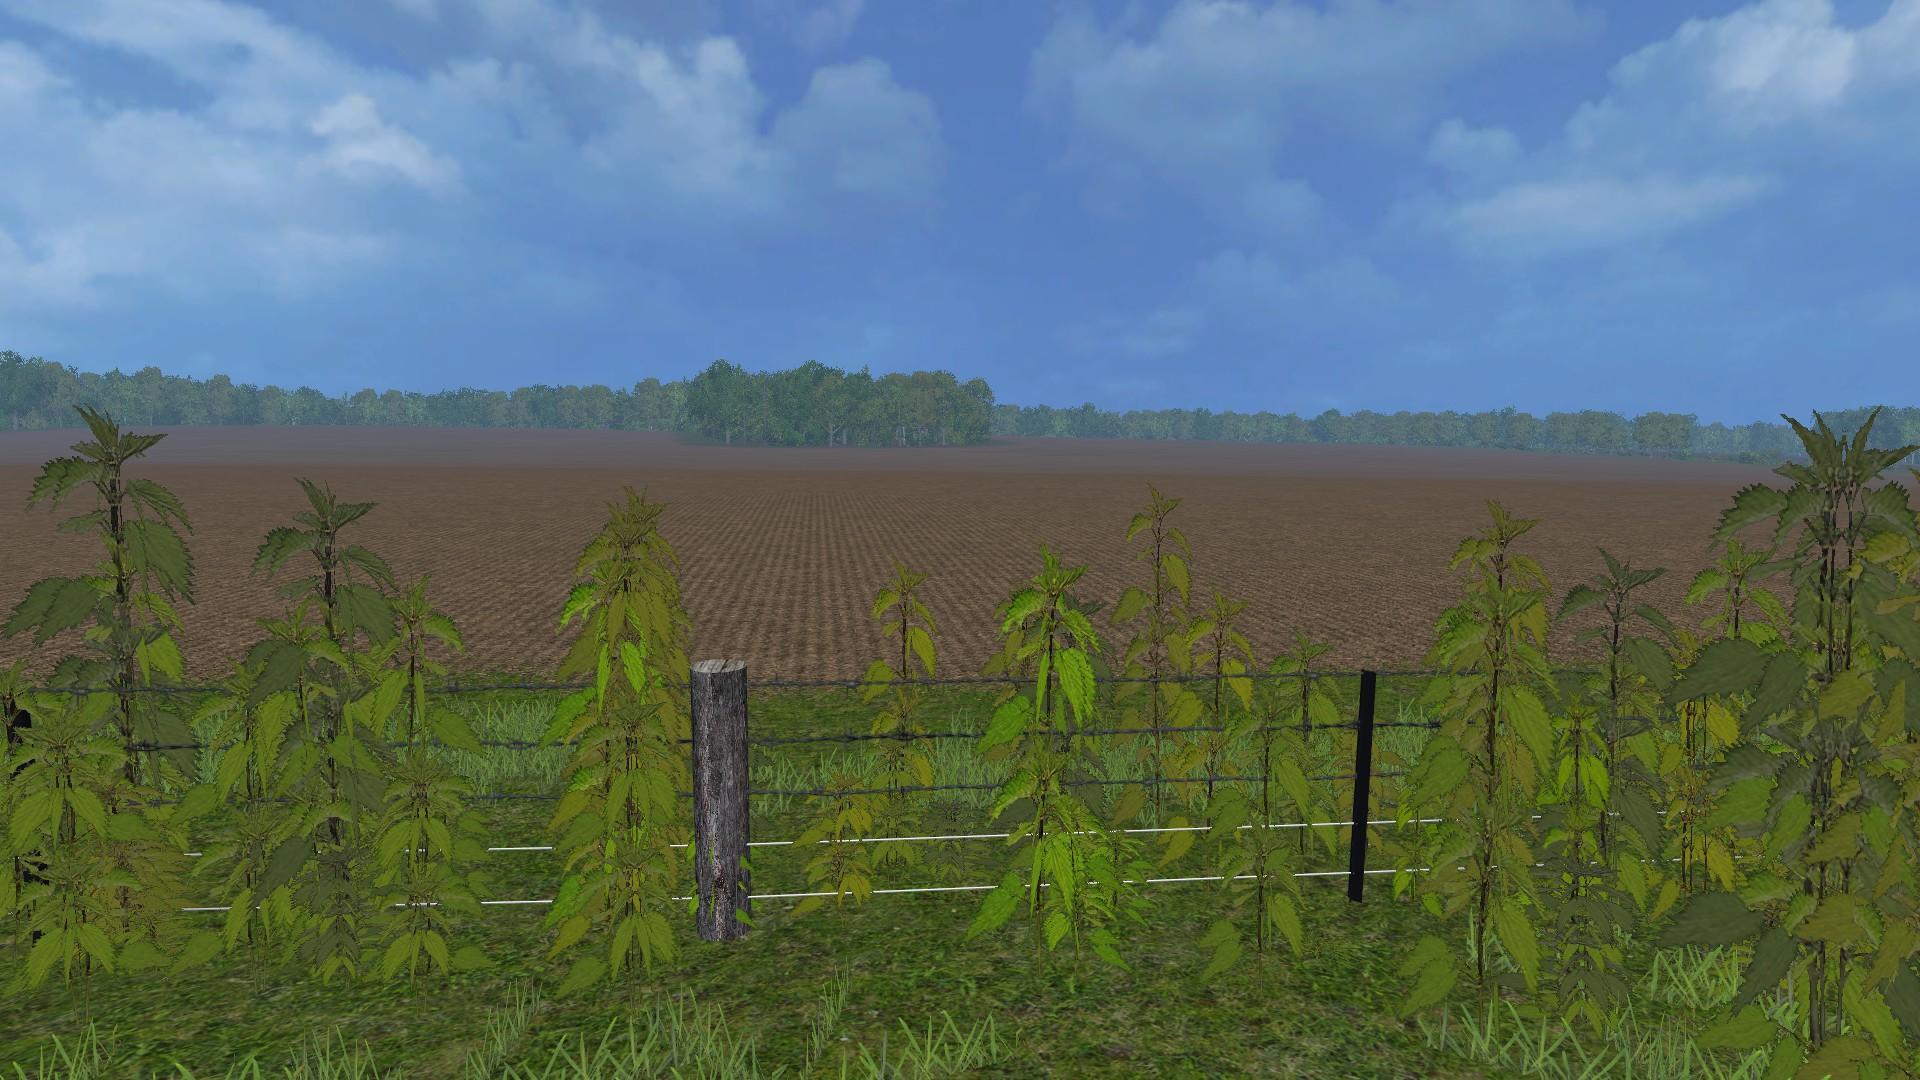 nettles-foliage-texture-v1-0_1